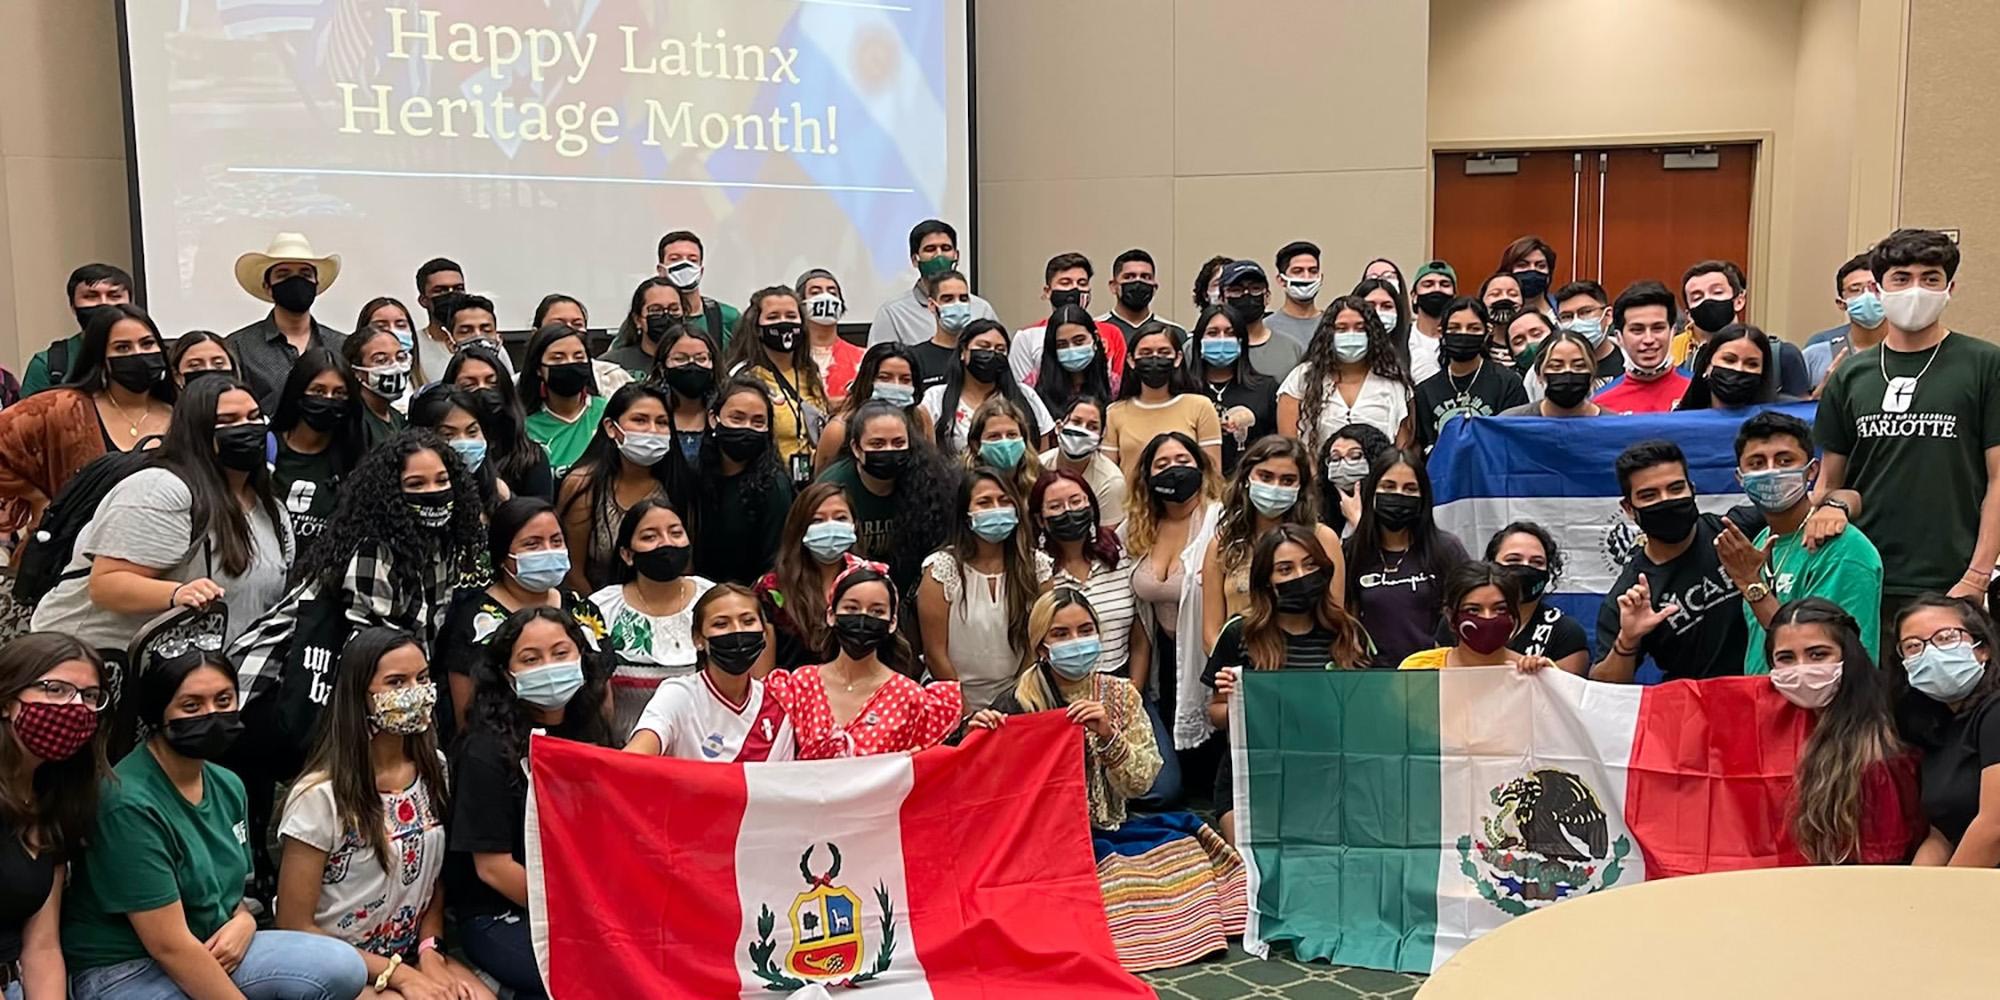 UNC Charlotte's Latin American Student Organization members